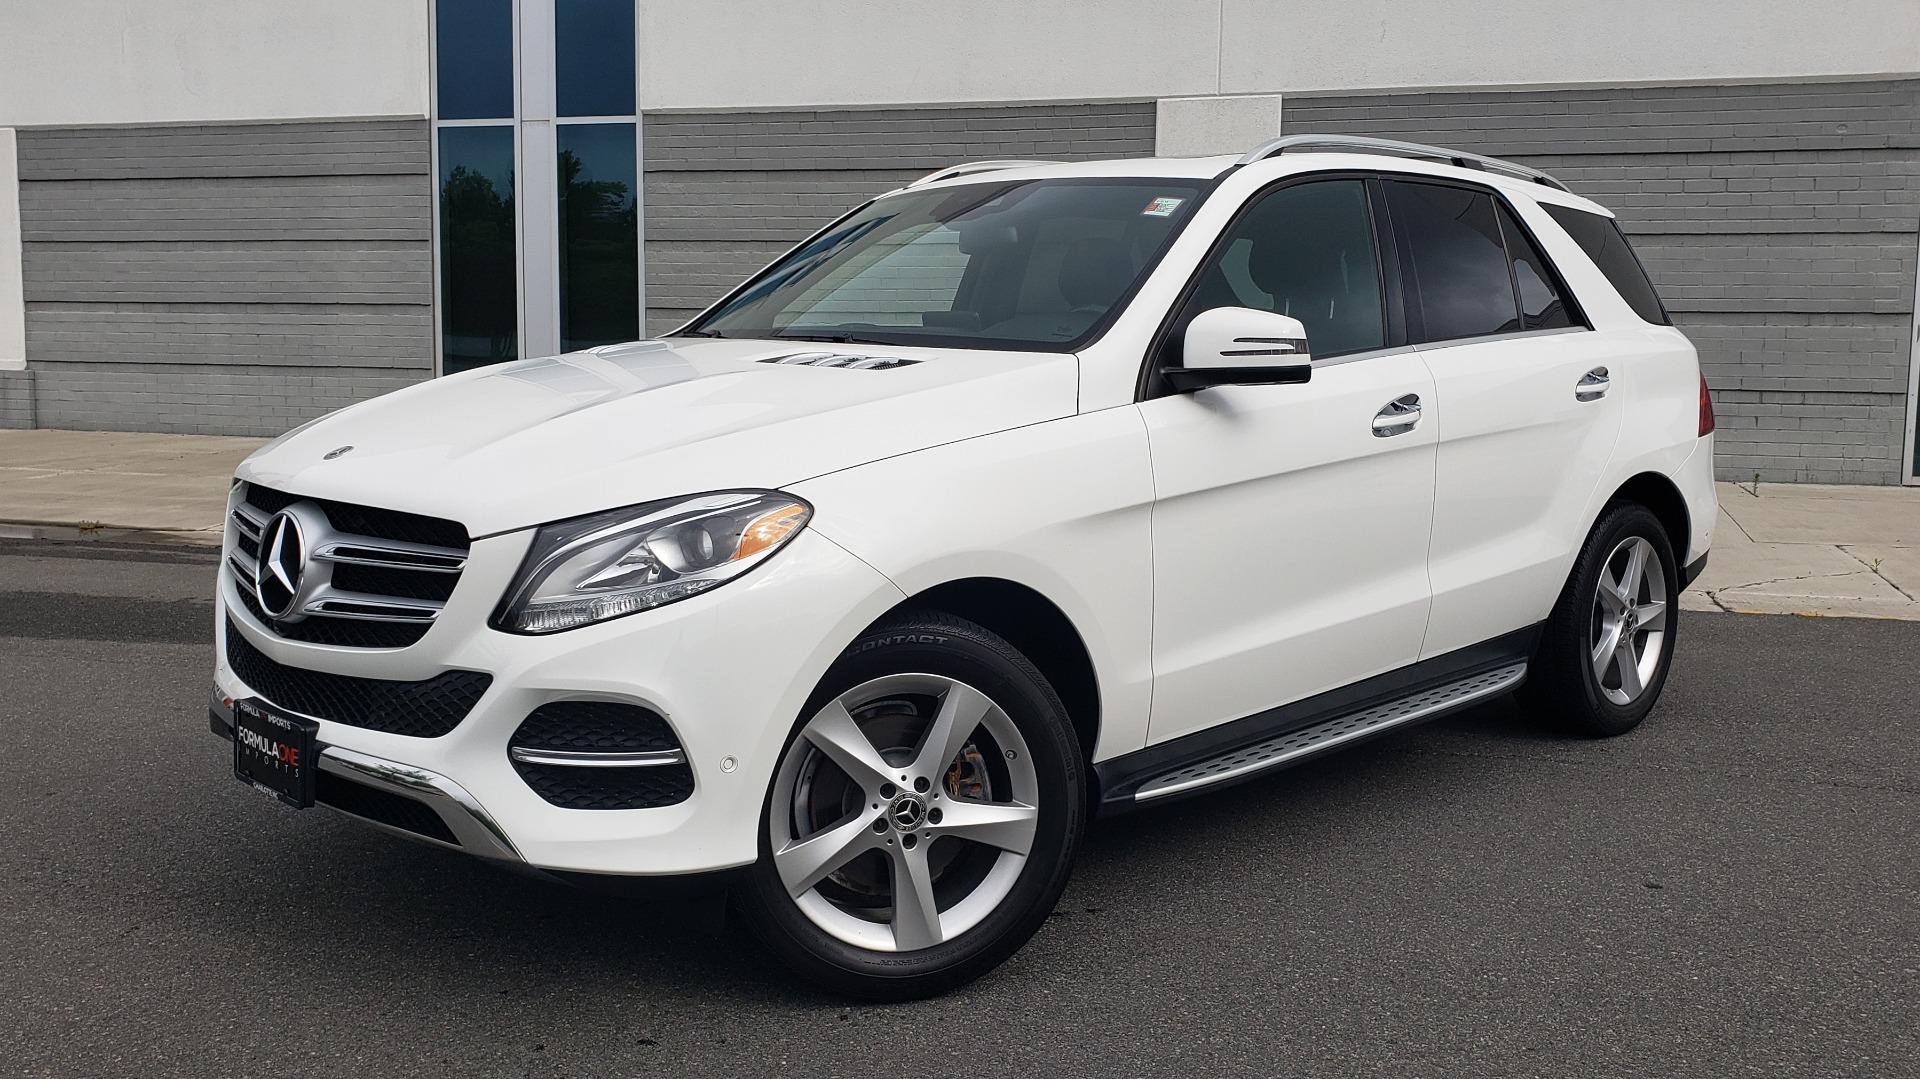 Used 2018 Mercedes-Benz GLE 350 4MATIC / PREM PKG / NAV / PARK ASST / K/H SND / HITCH / REARVIEW for sale $40,801 at Formula Imports in Charlotte NC 28227 1